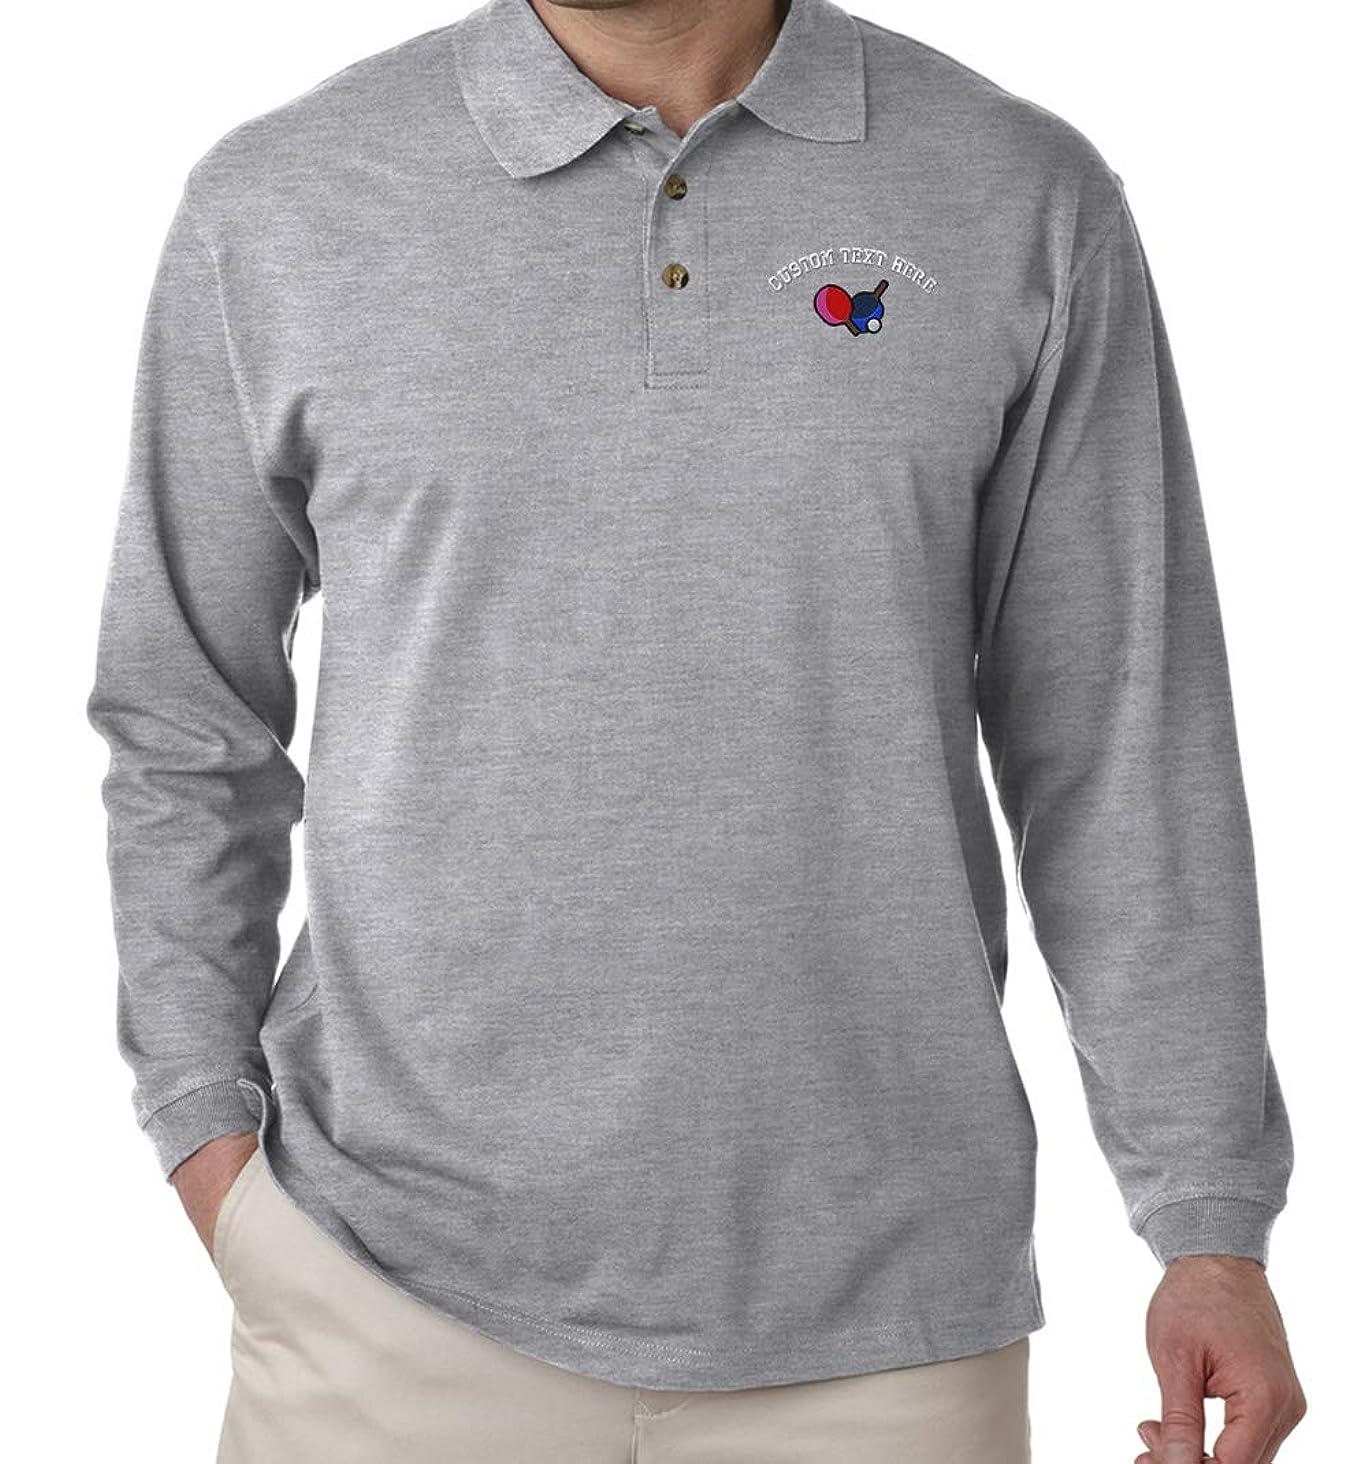 Custom Text Embroidered Table Tennis Long Sleeve Cotton Polo Golf Shirt